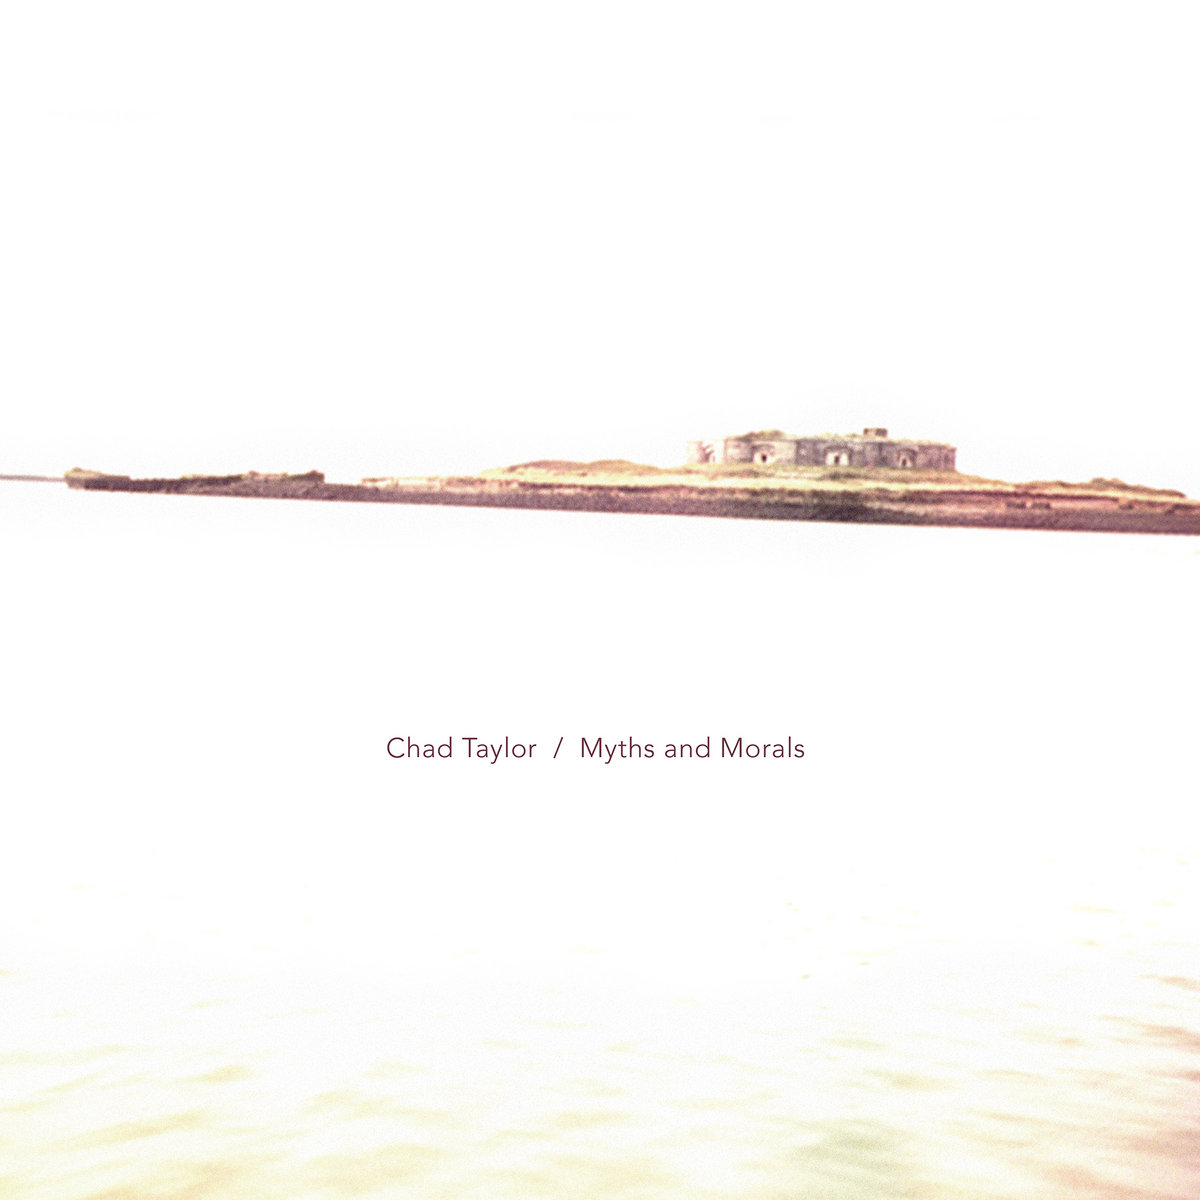 myths and morals chad taylor